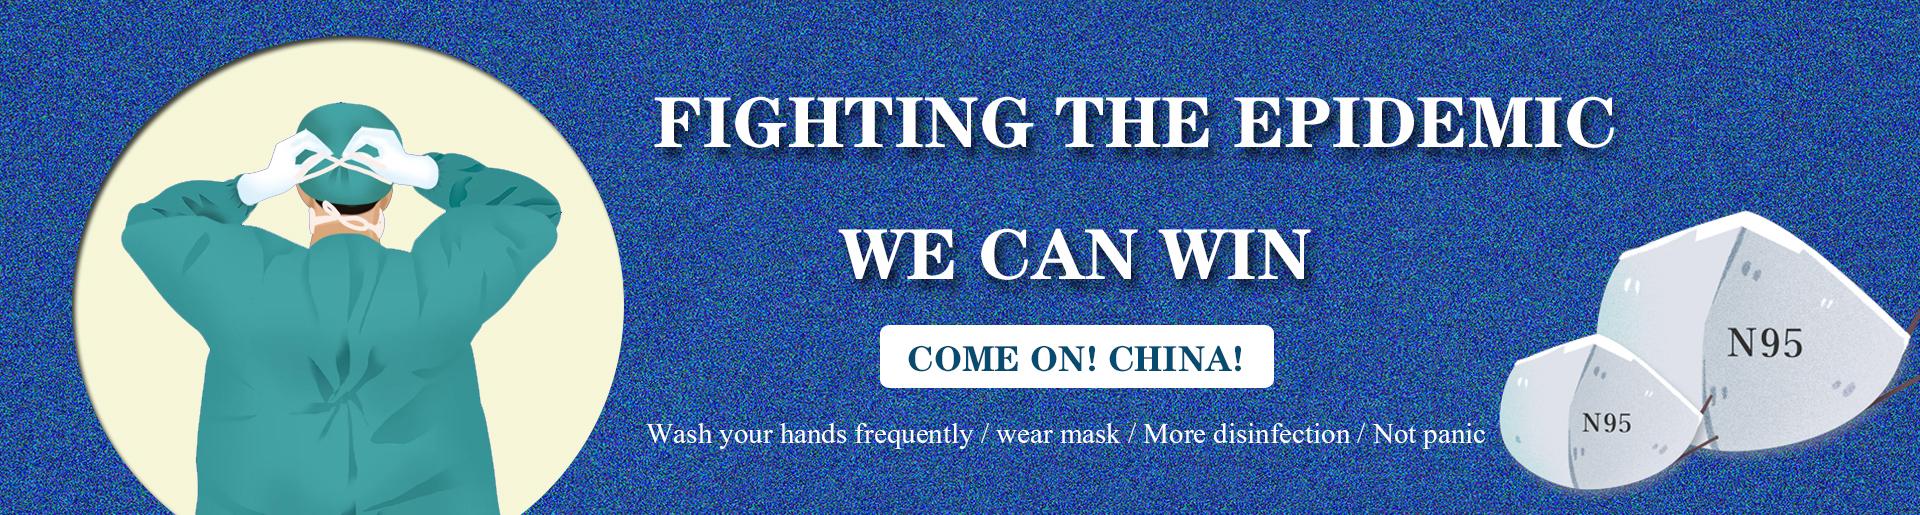 yiqing banner2